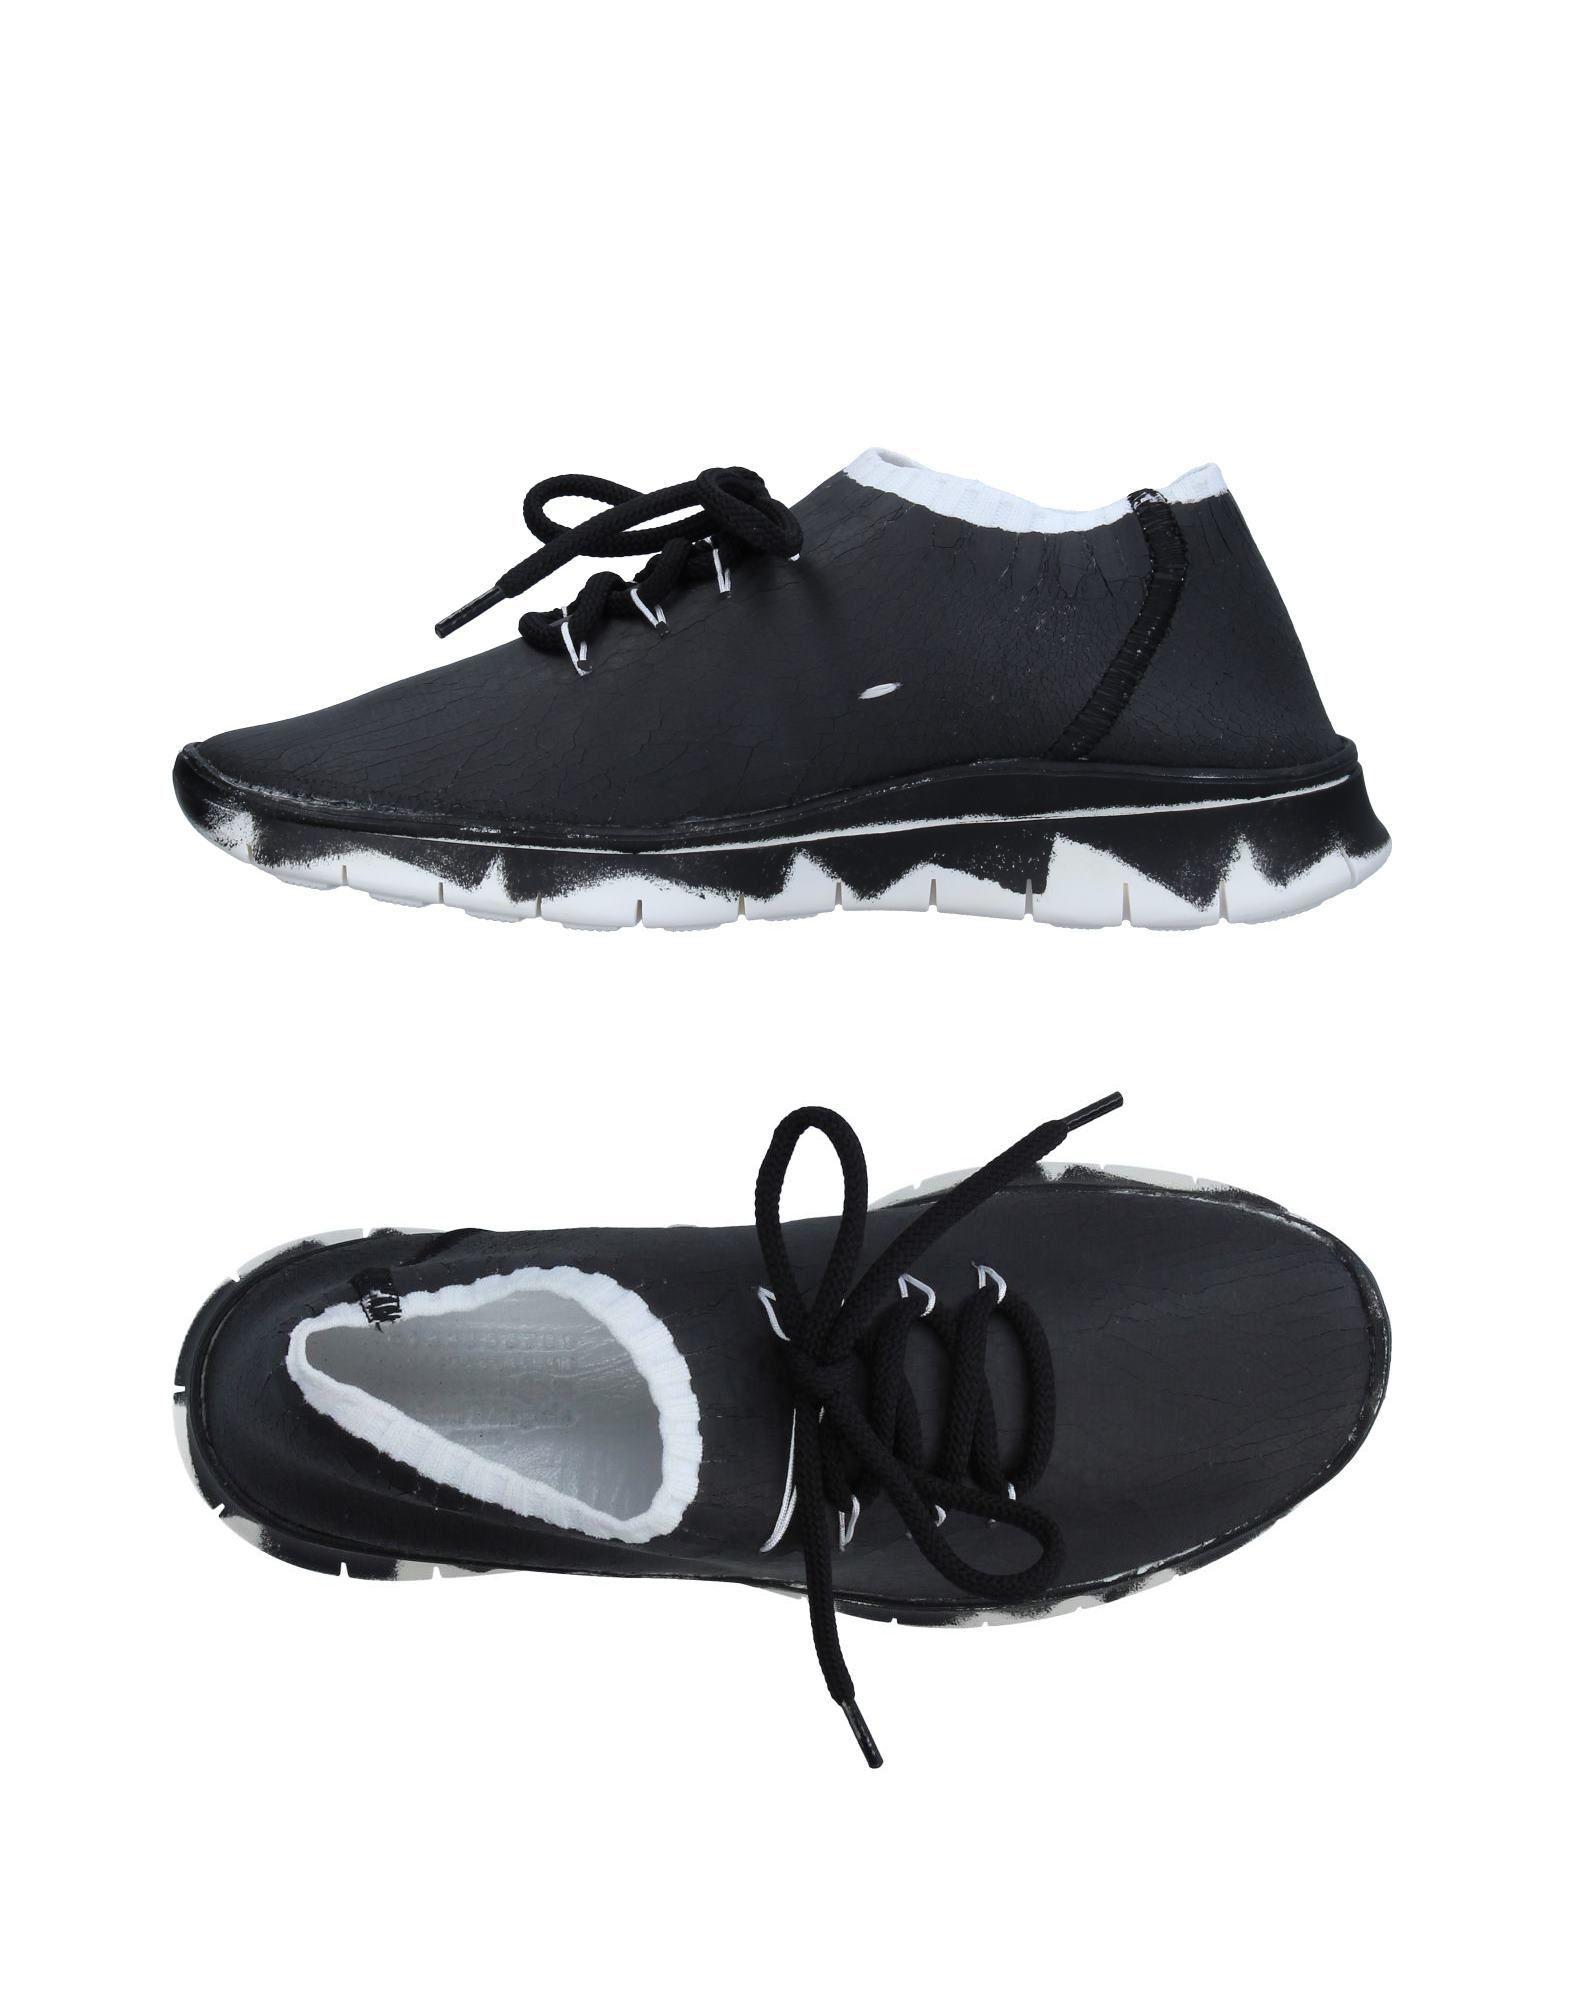 Maison Margiela Sneakers Herren  11337208TQ Gute Qualität beliebte Schuhe